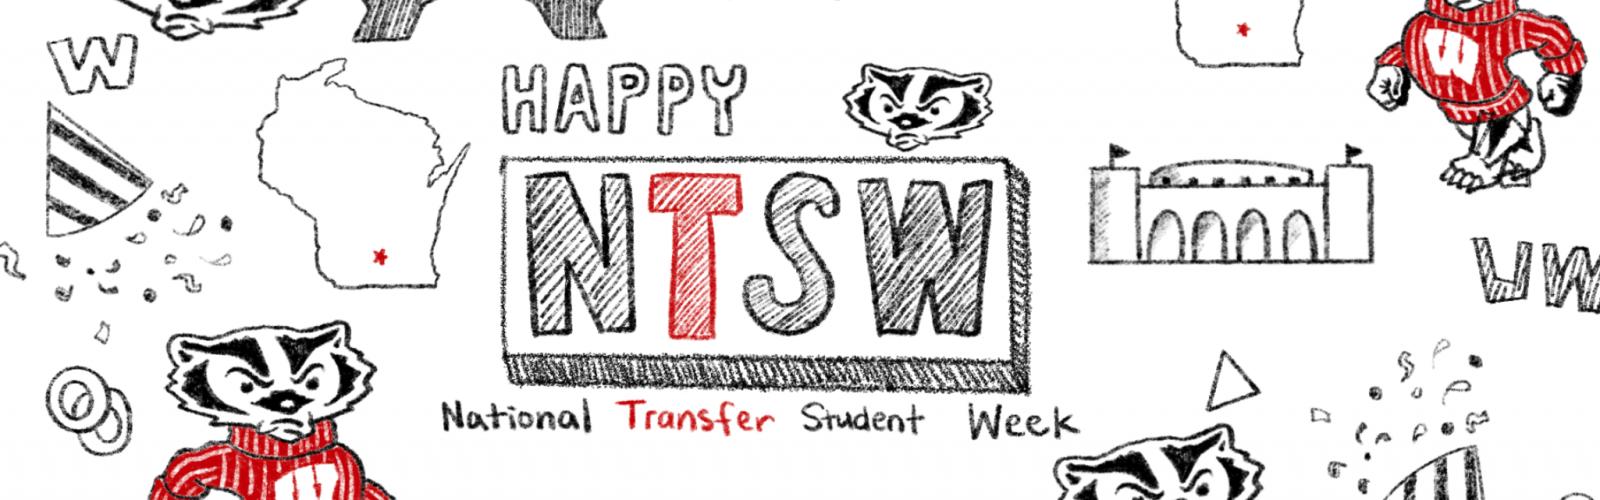 National Transfer Student Week - October 19-23